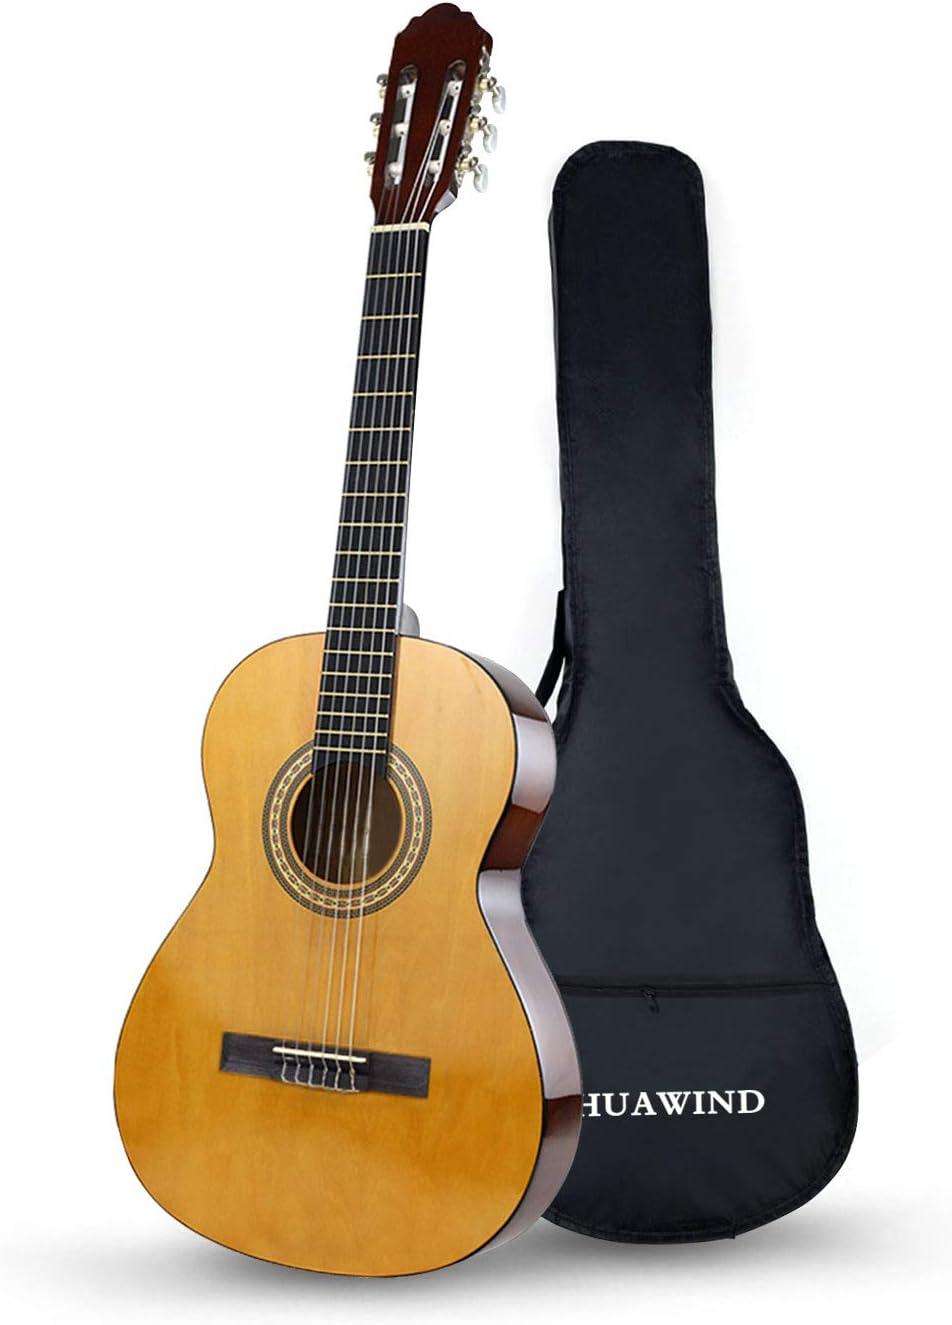 HUAWIND Guitarra Clásica 4/4, Guitarra Española con 6 Cuerdas de Nylon, Guitarra para Principiantes, Adultos, Niños